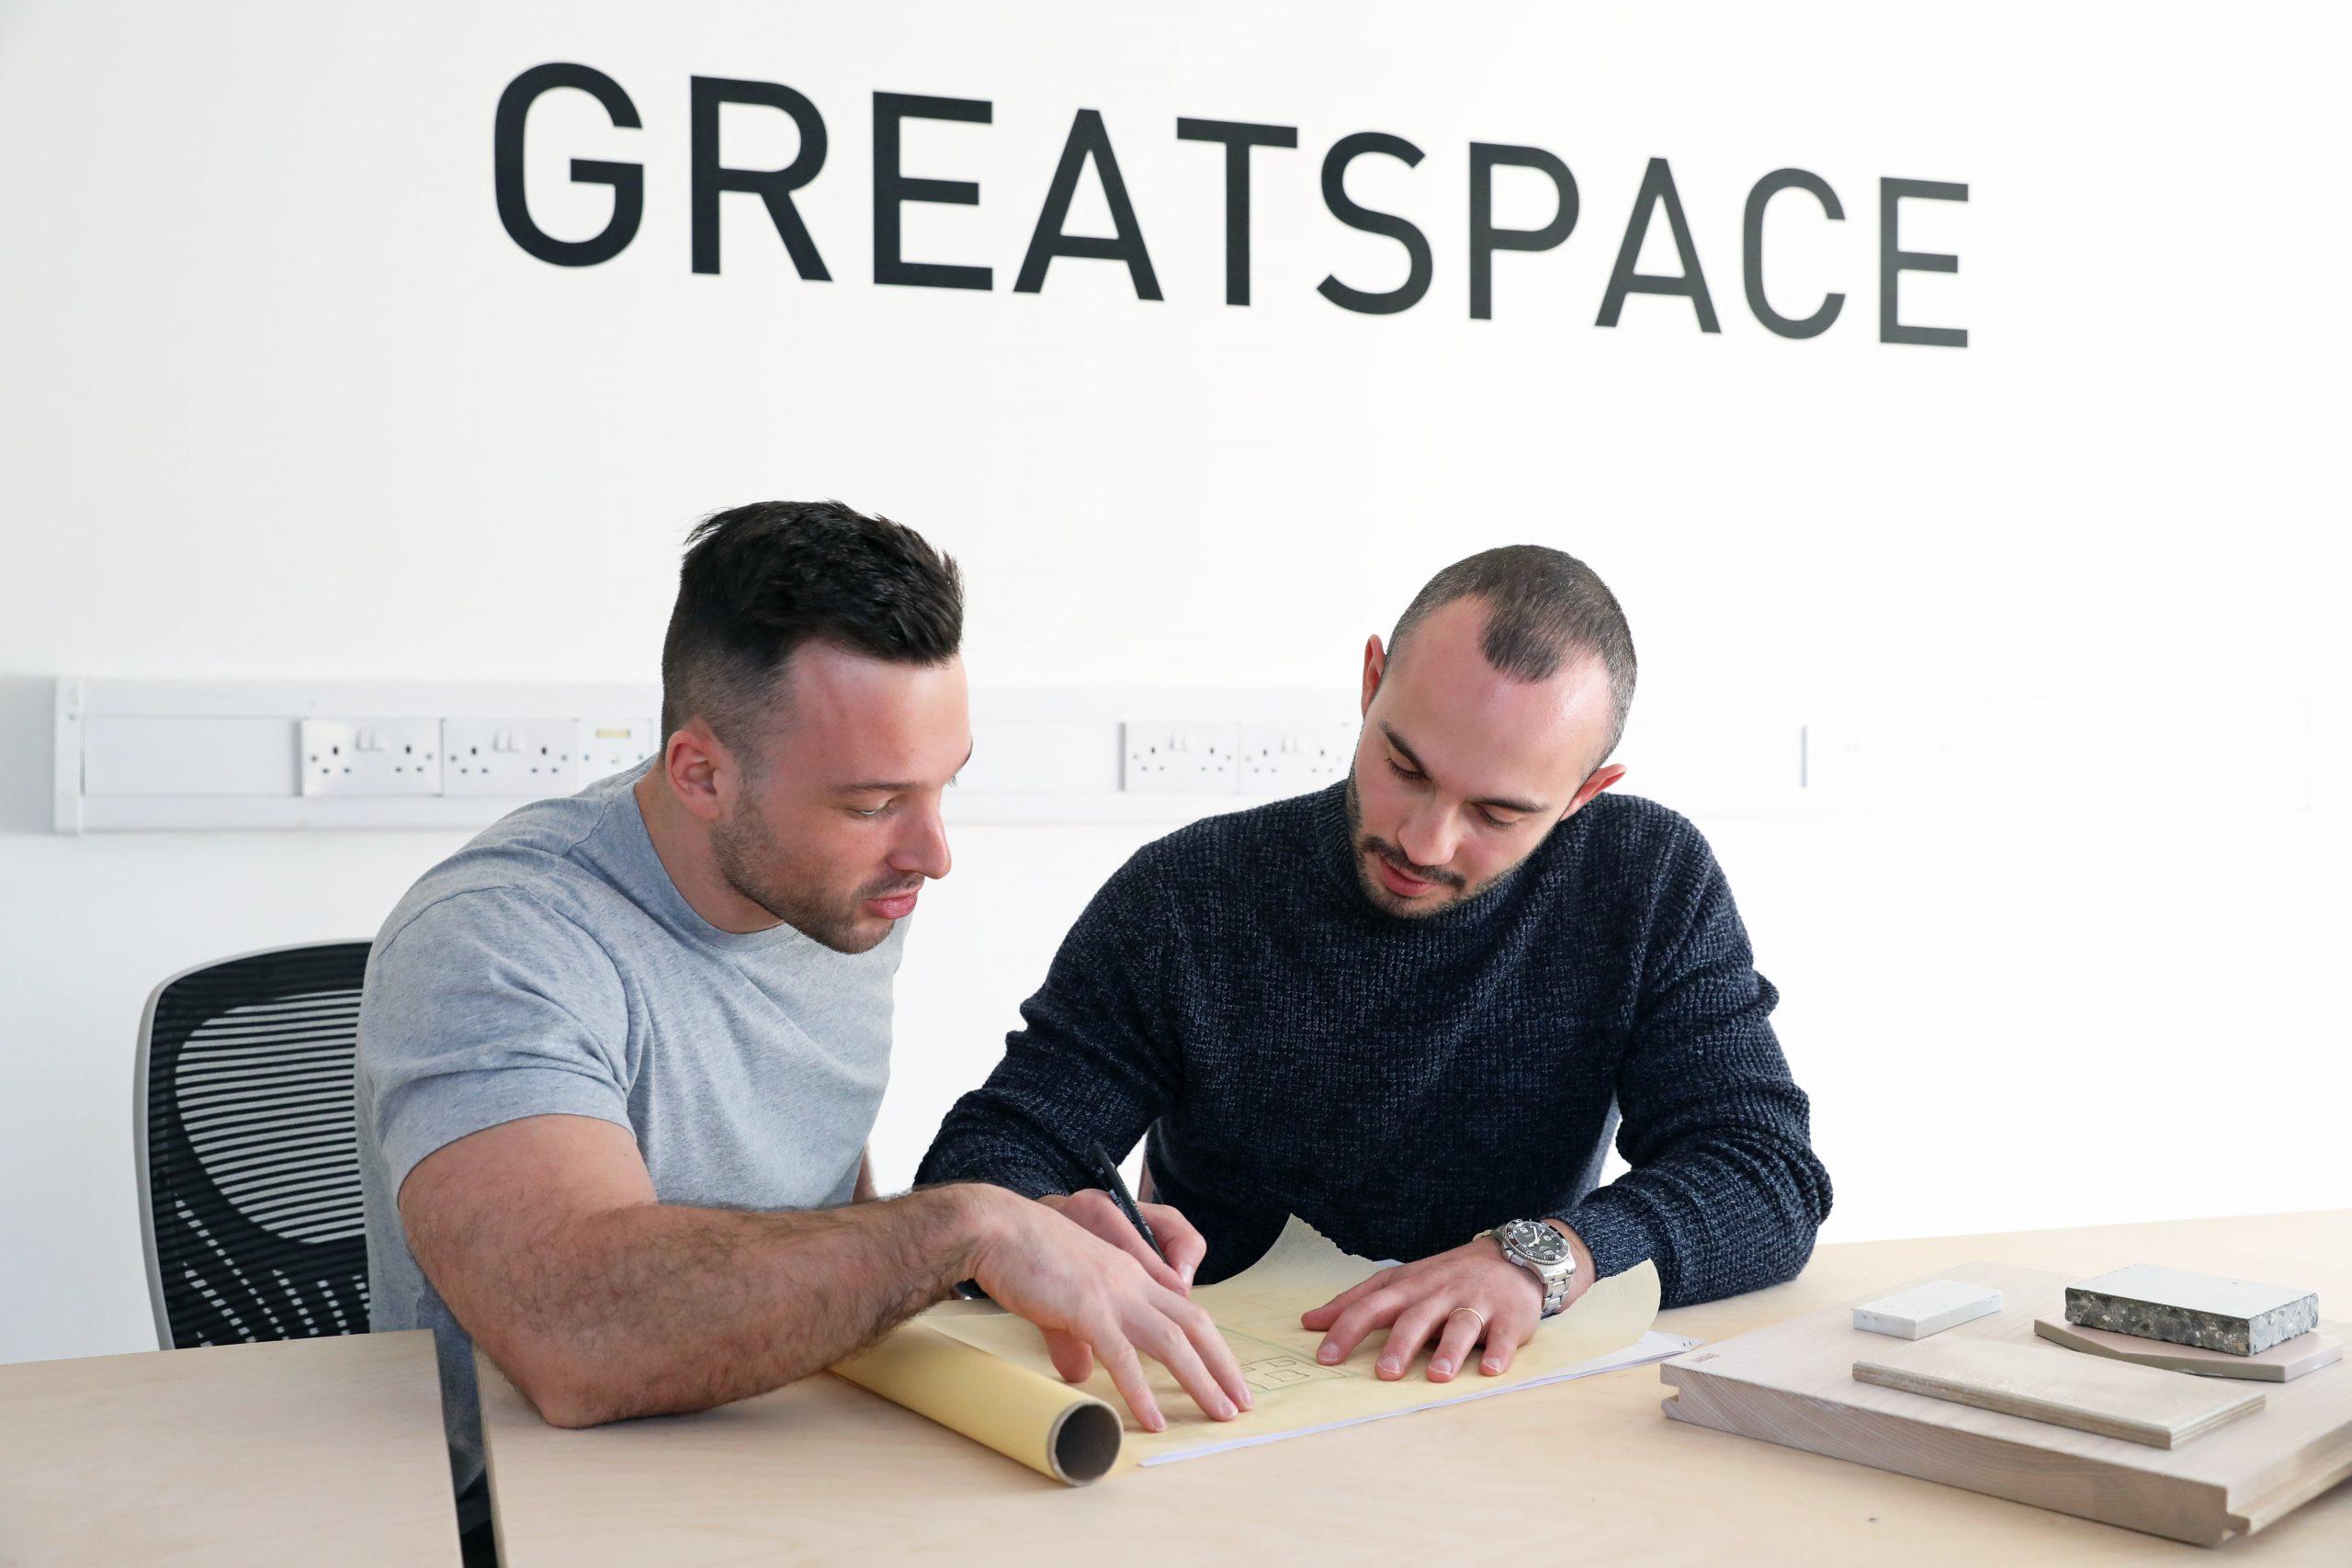 Greatspace Studio